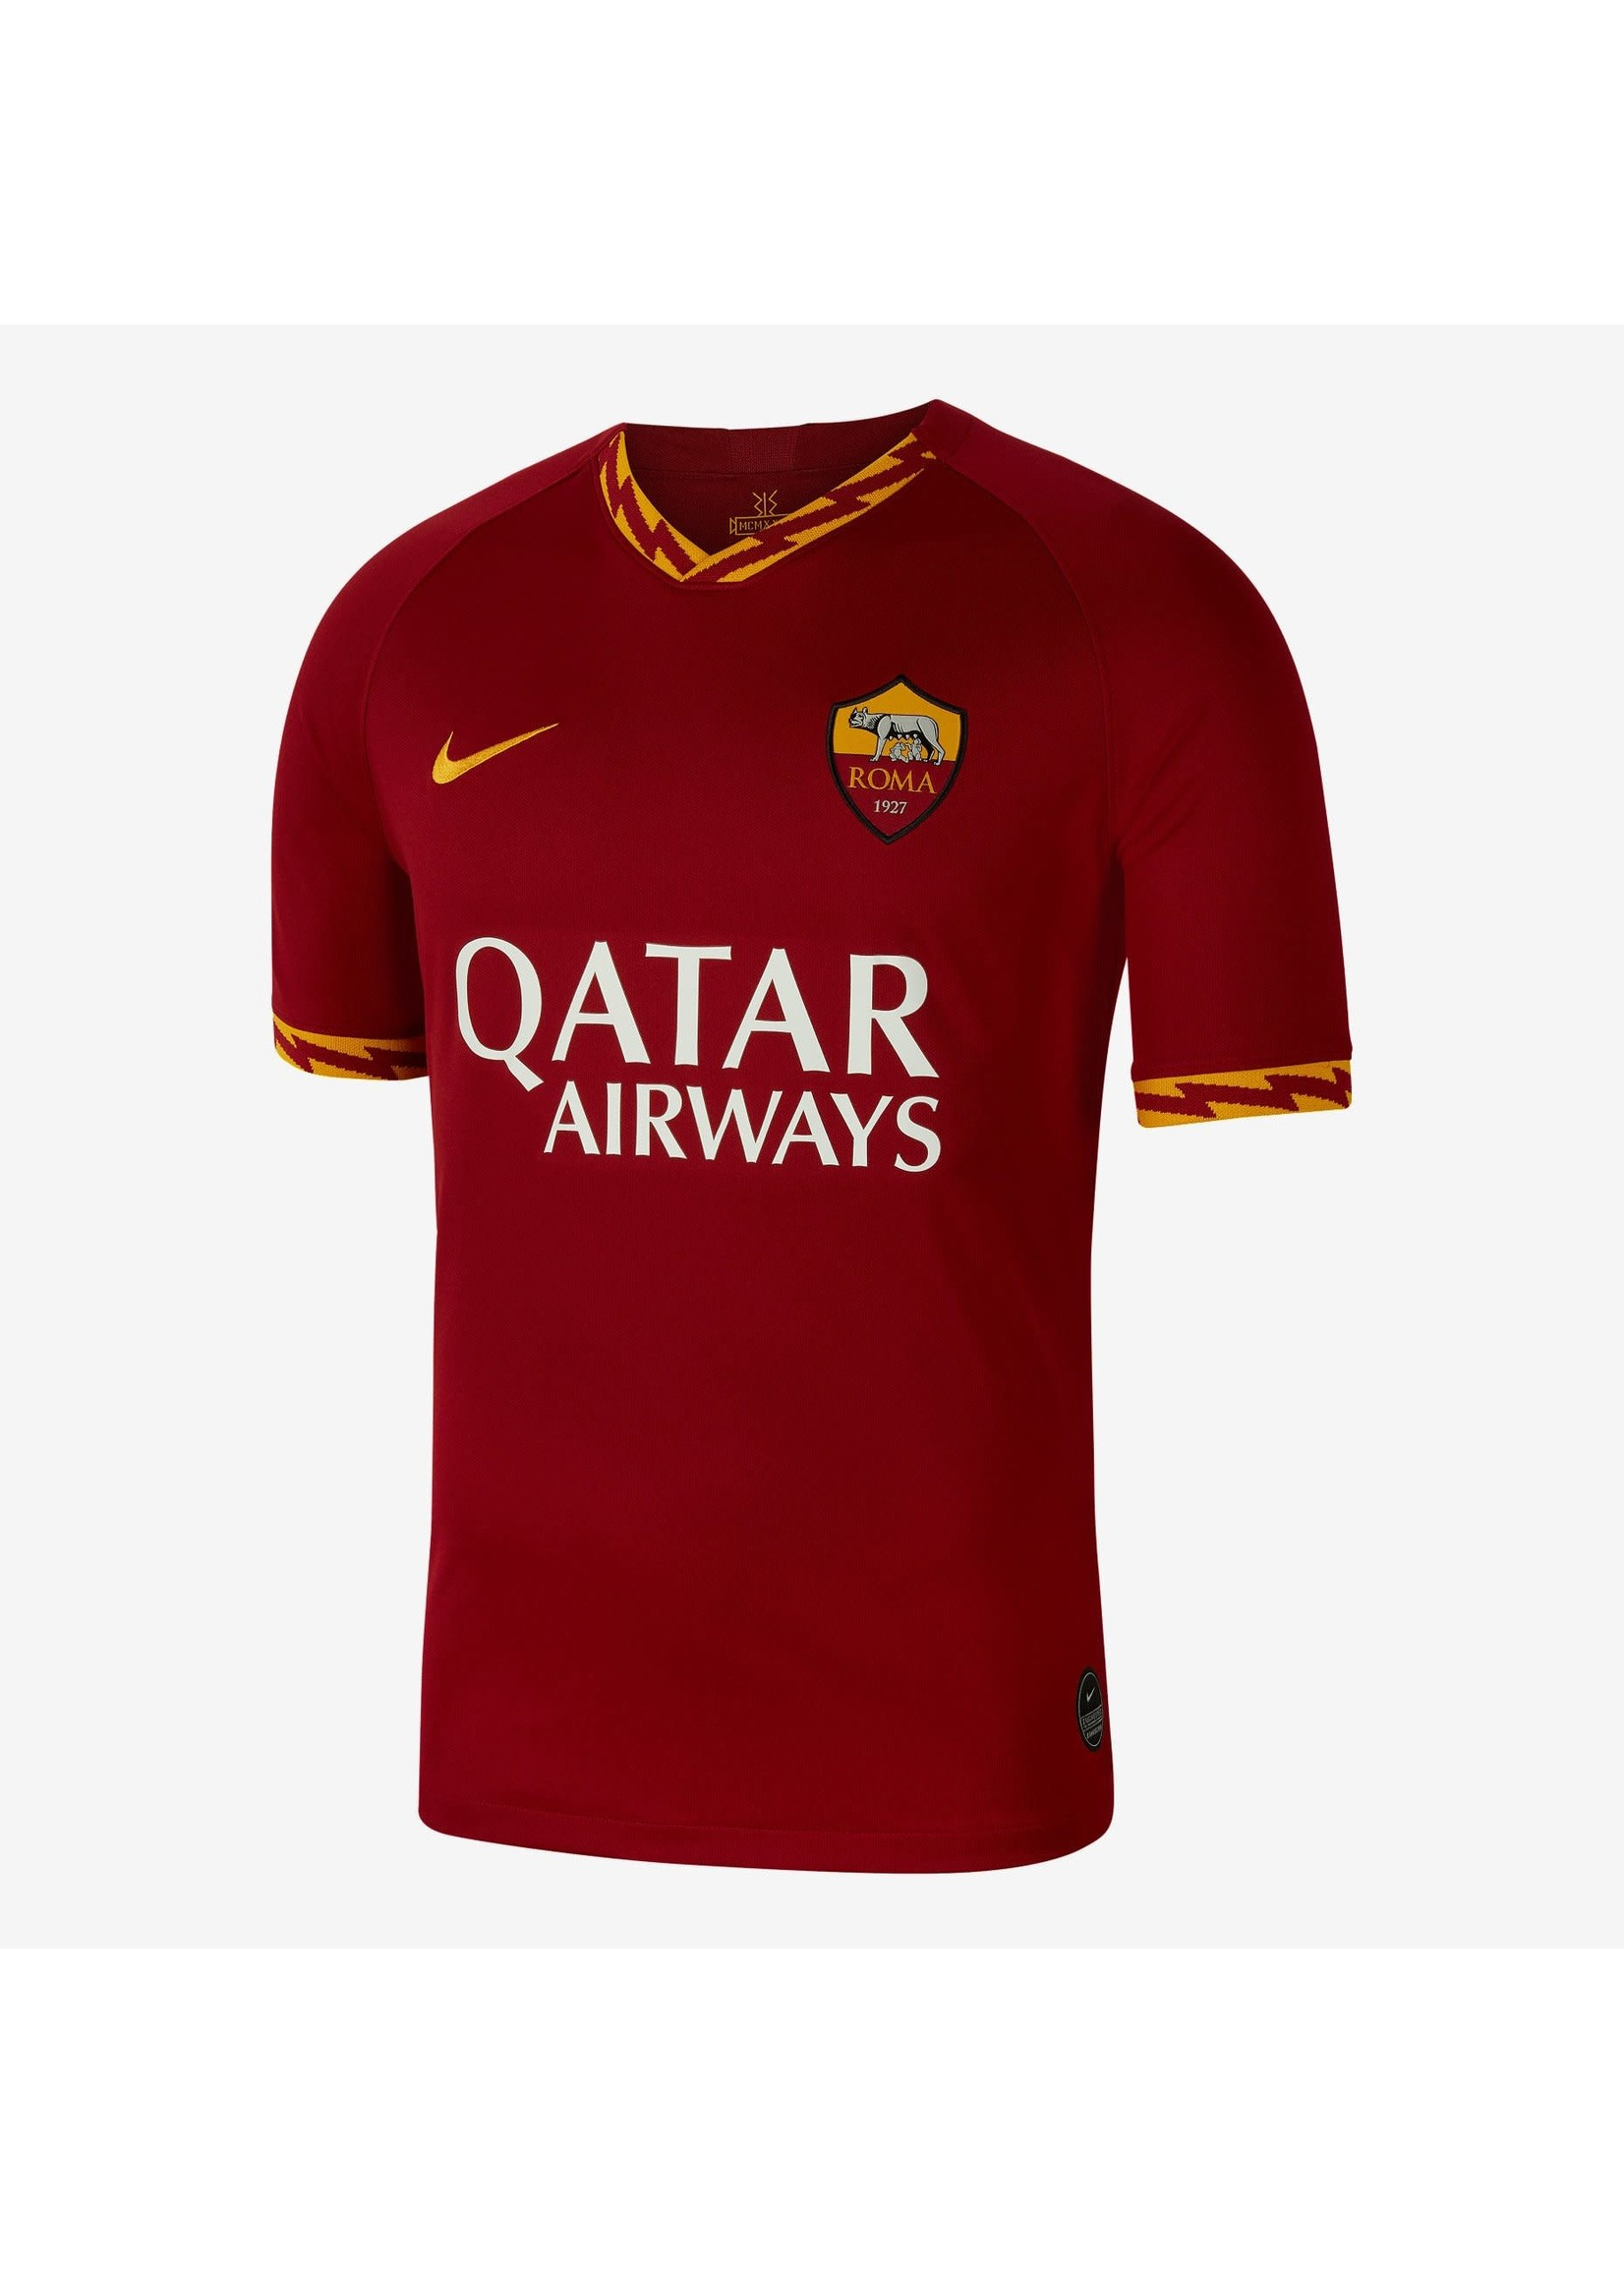 Nike Roma 19/20 Home Jersey Adult Medium